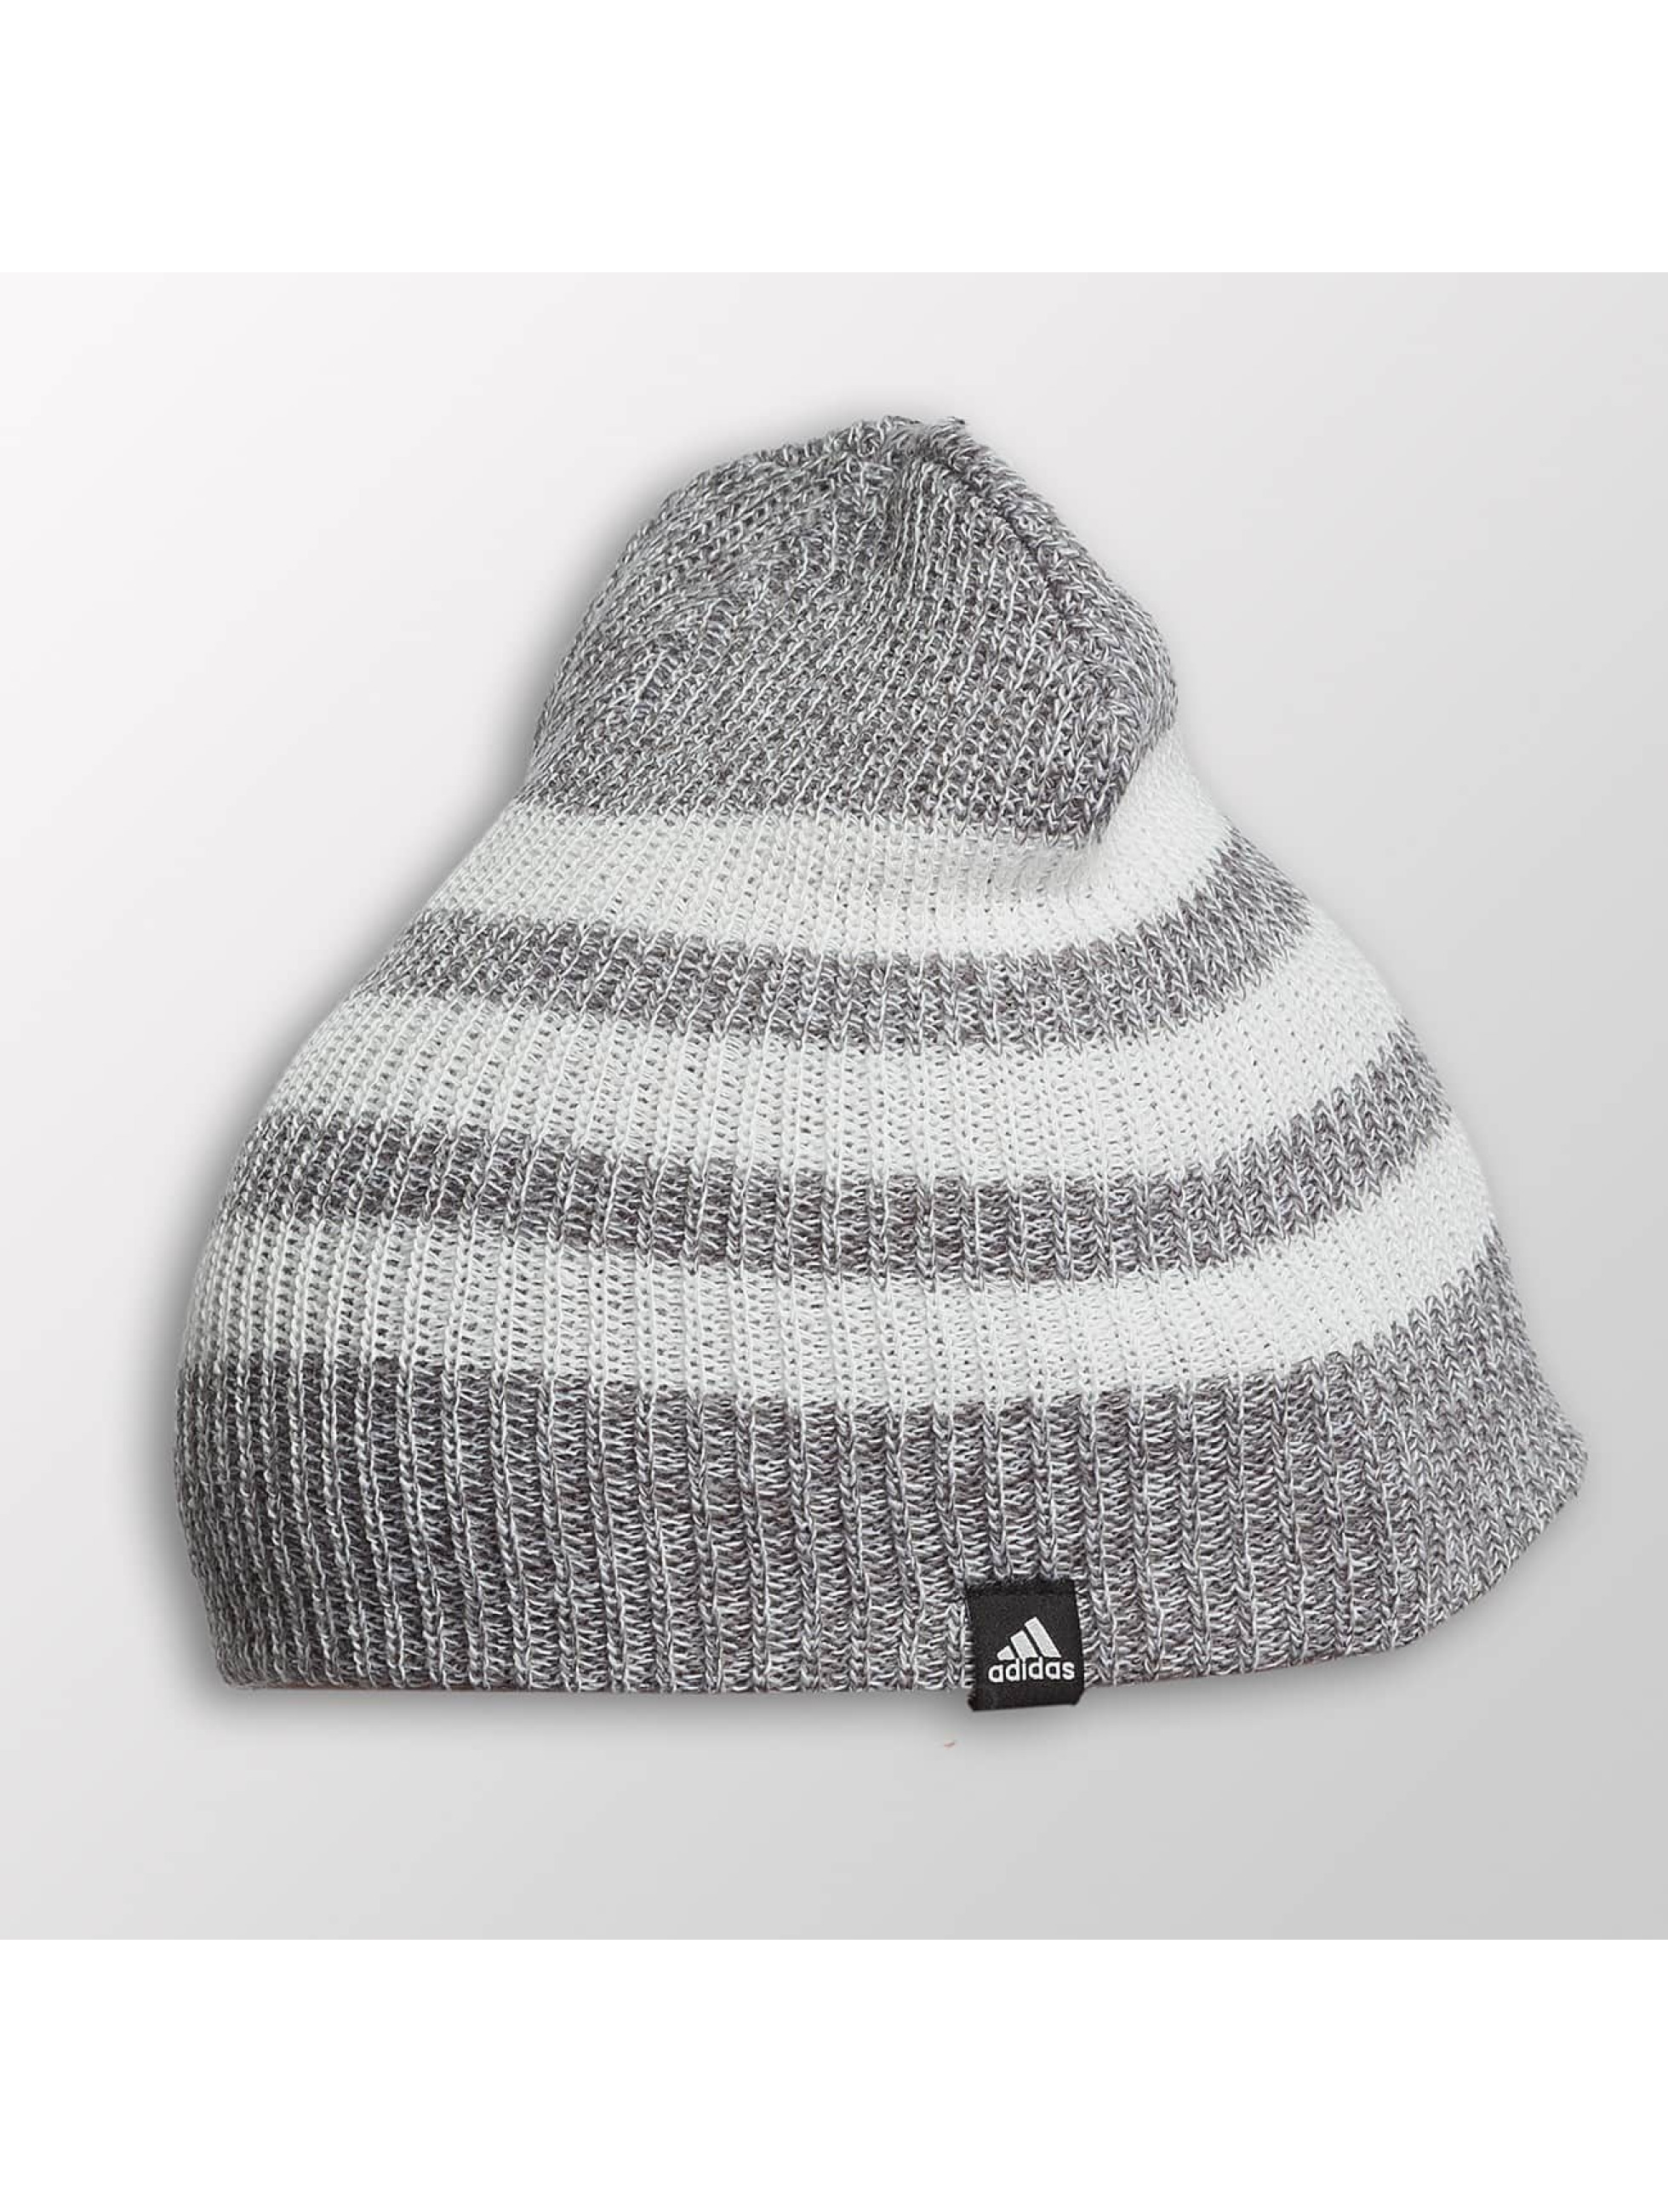 adidas Beanie Adidas 3S grijs